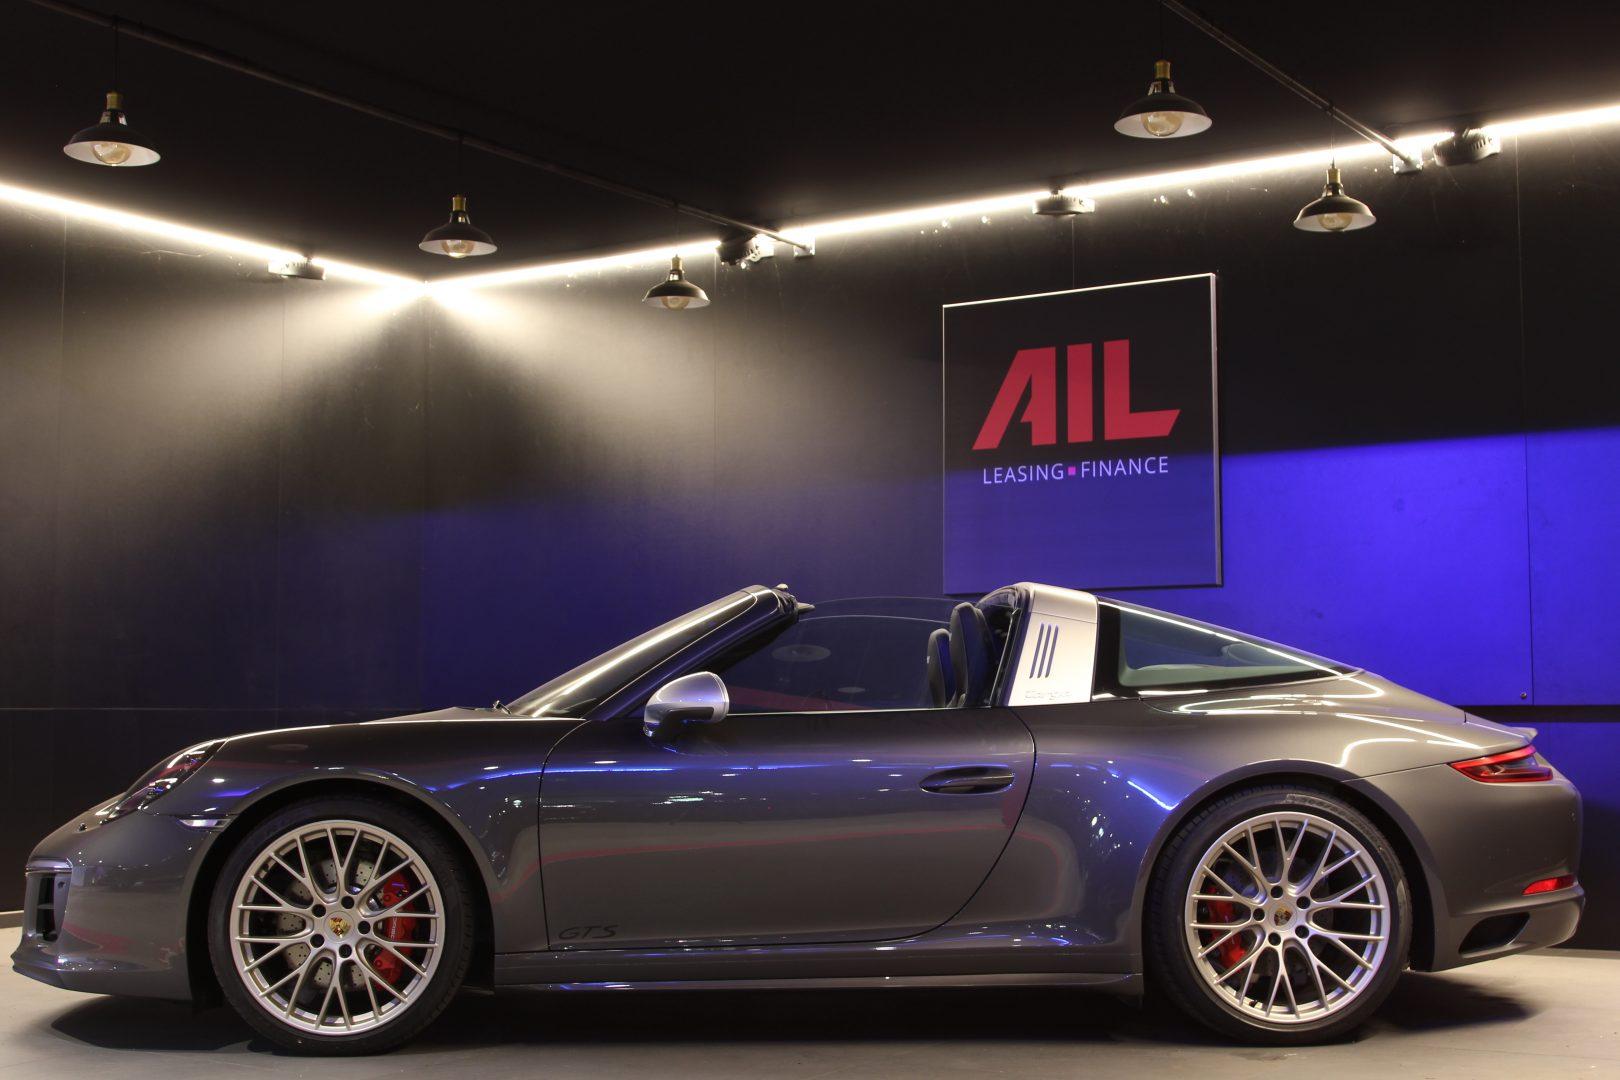 AIL Porsche 991 Targa 4 GTS Exclusiv 11